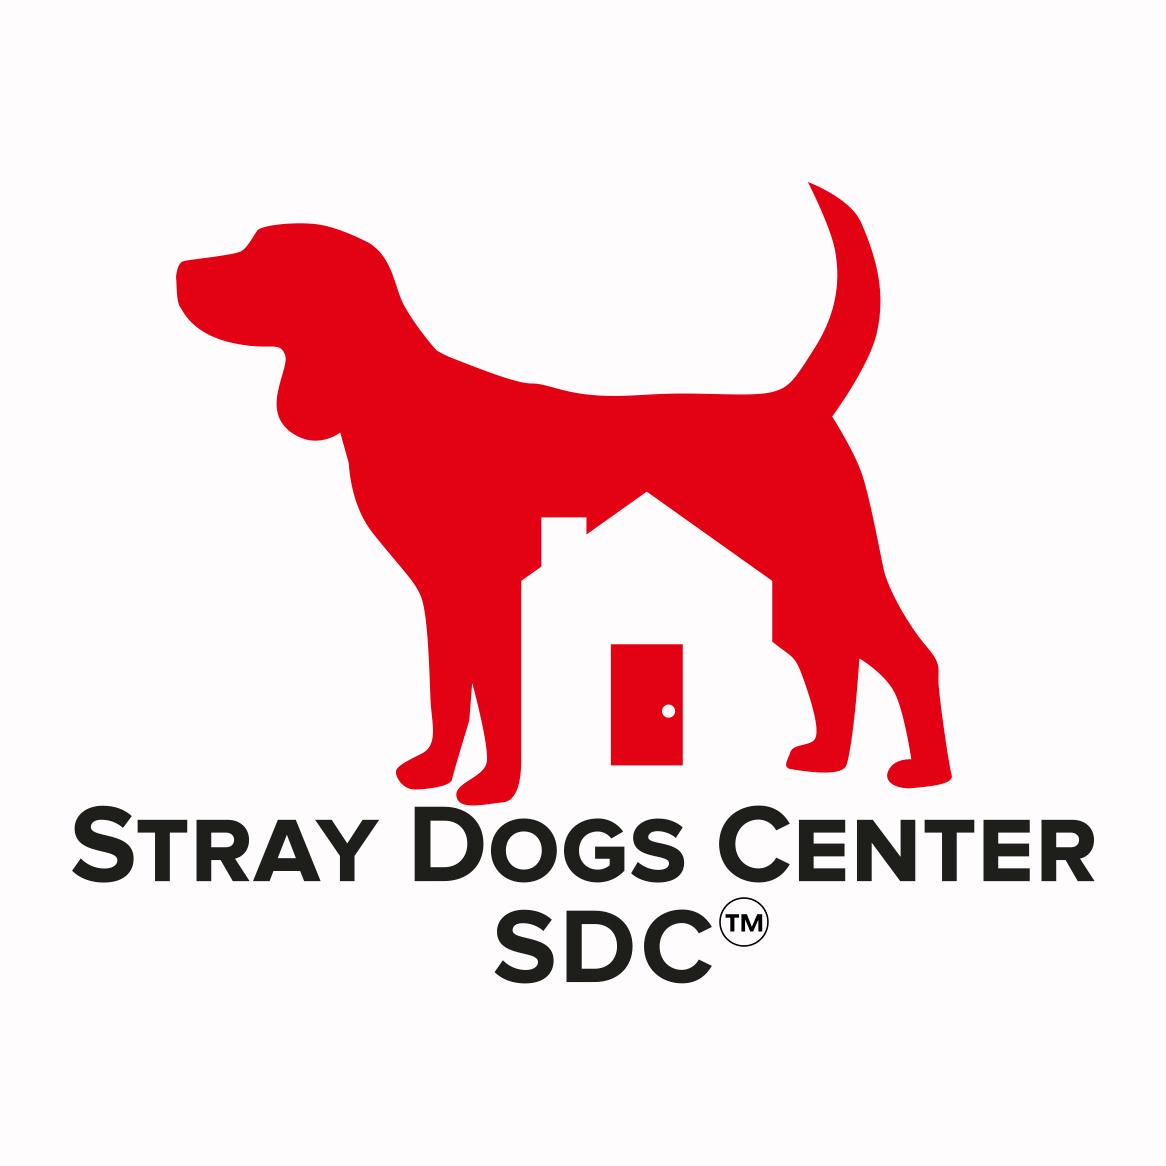 Stray Dogs Center logo